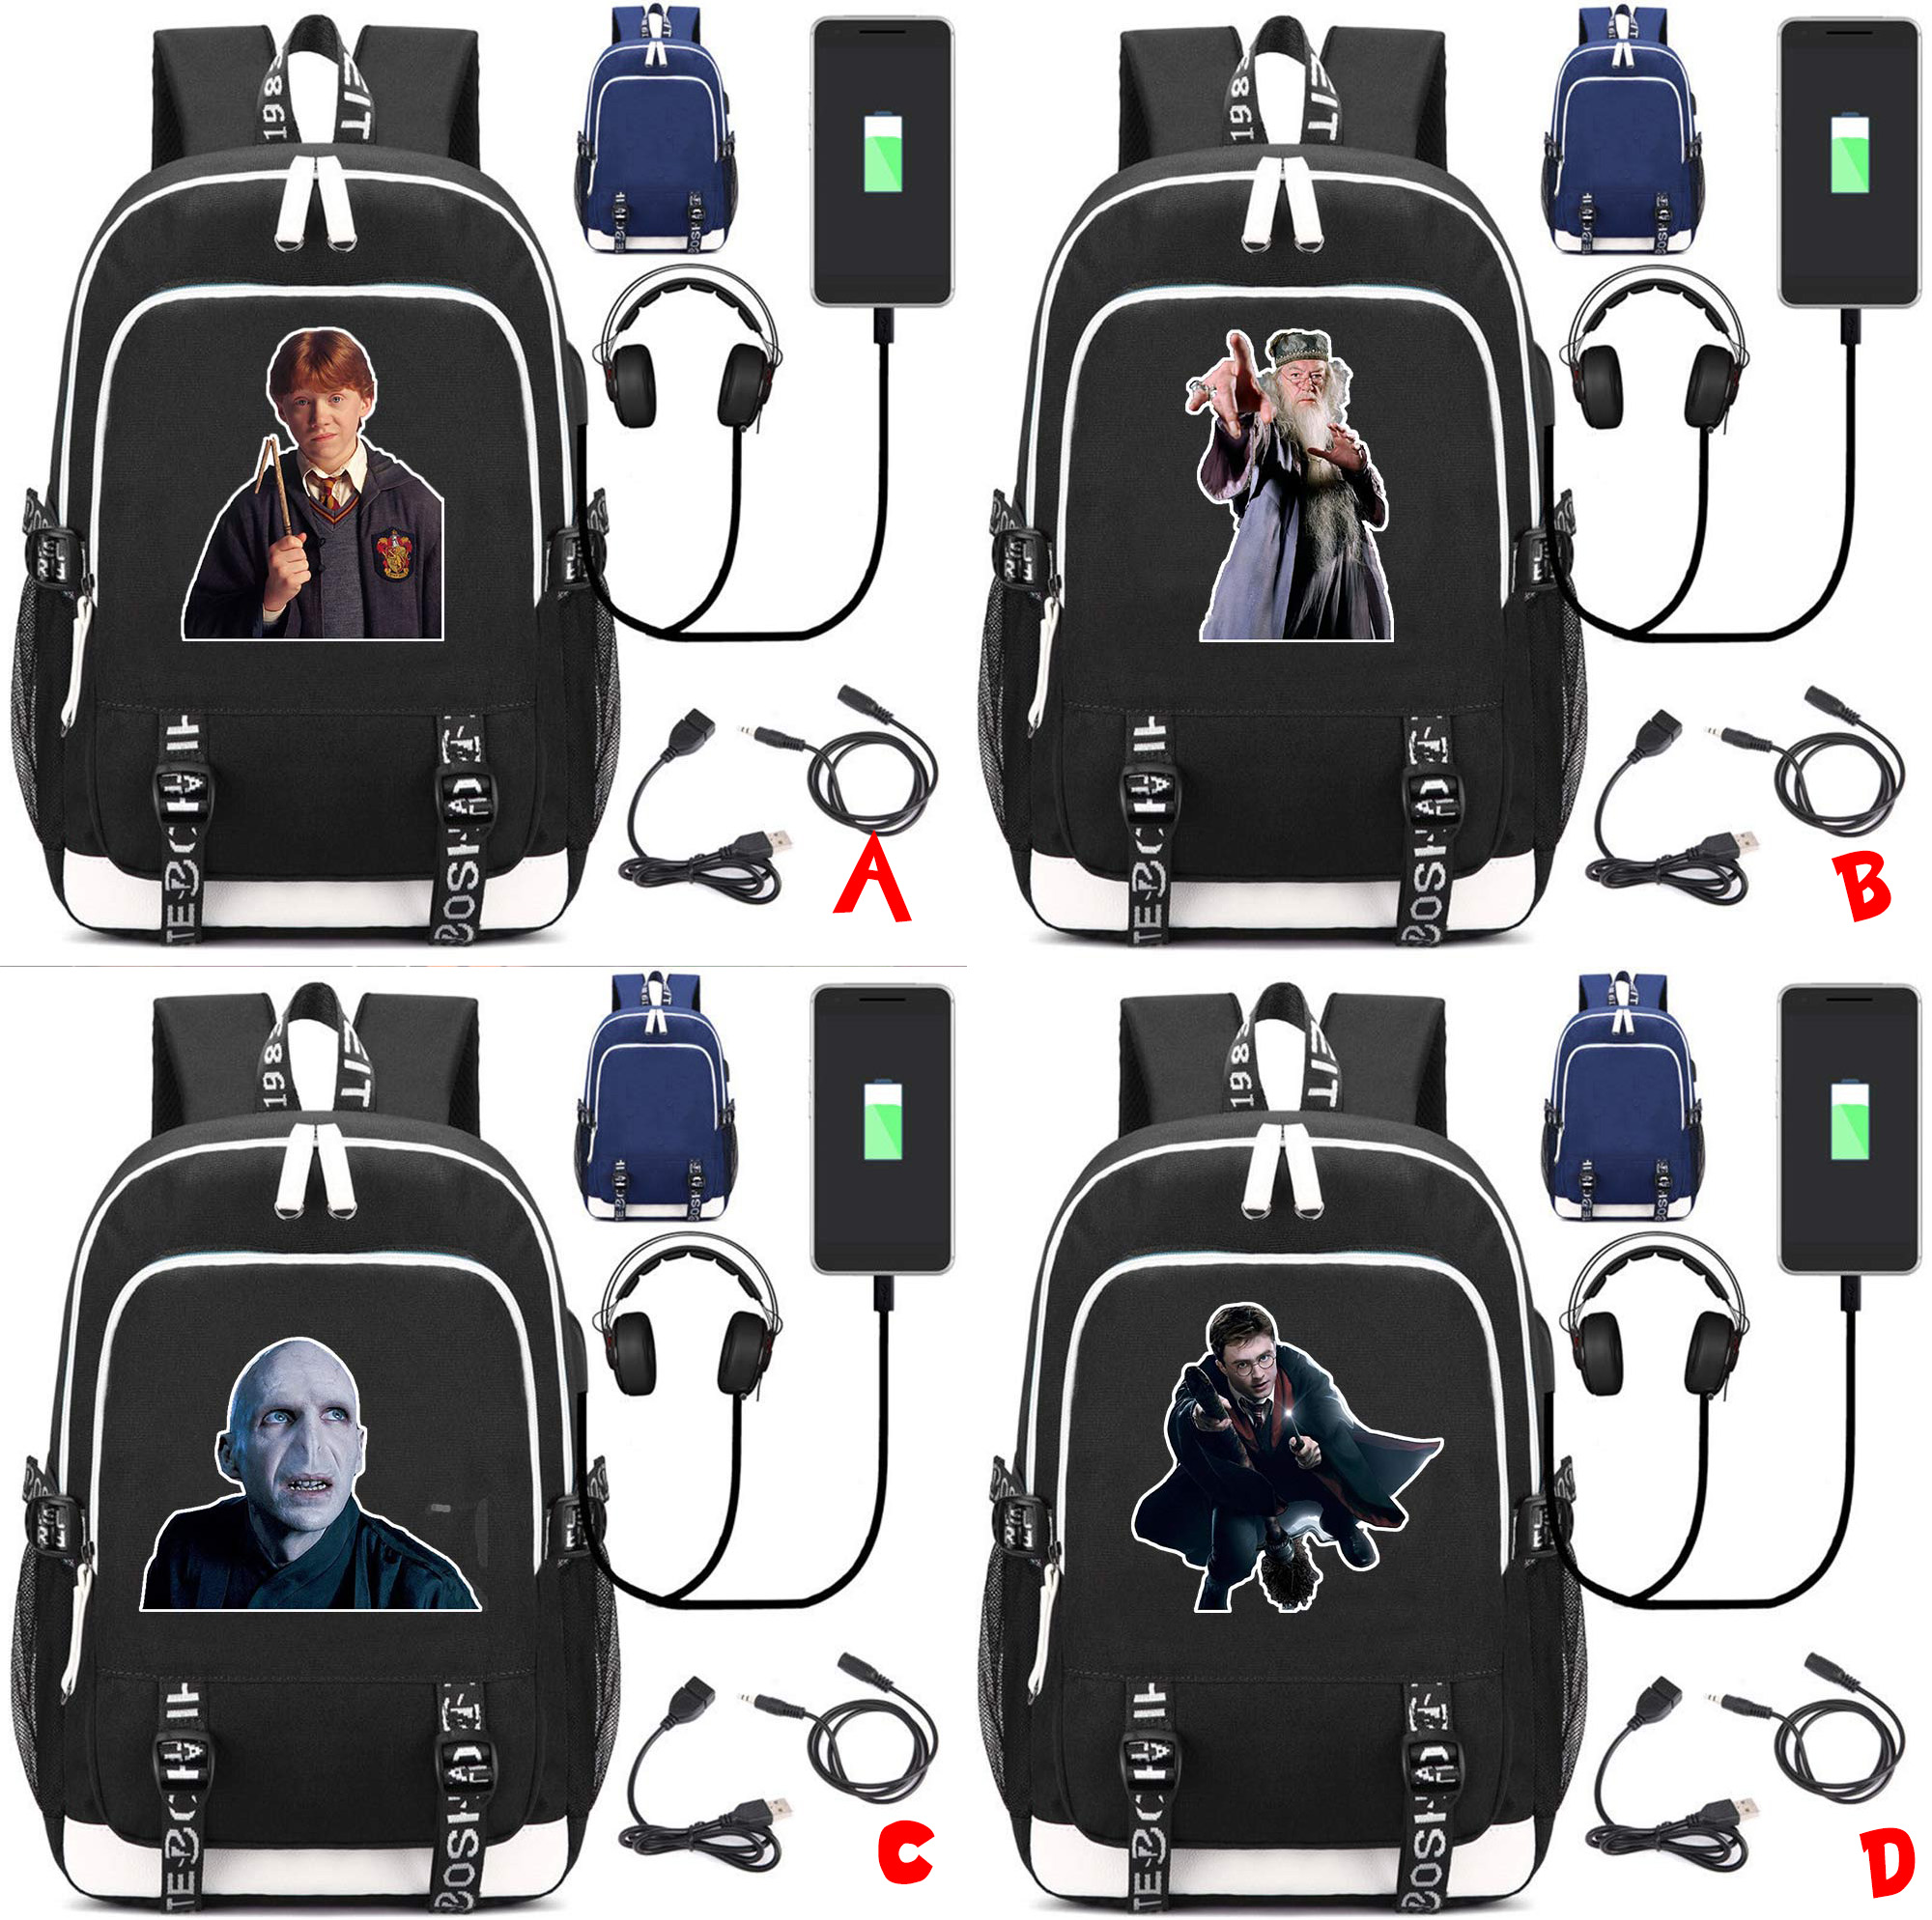 Harri Potter Backpack Lord Voldemort Notebook Backpack Multifunction USB Charging Backpack Laptop Bag Travel Student School Bag